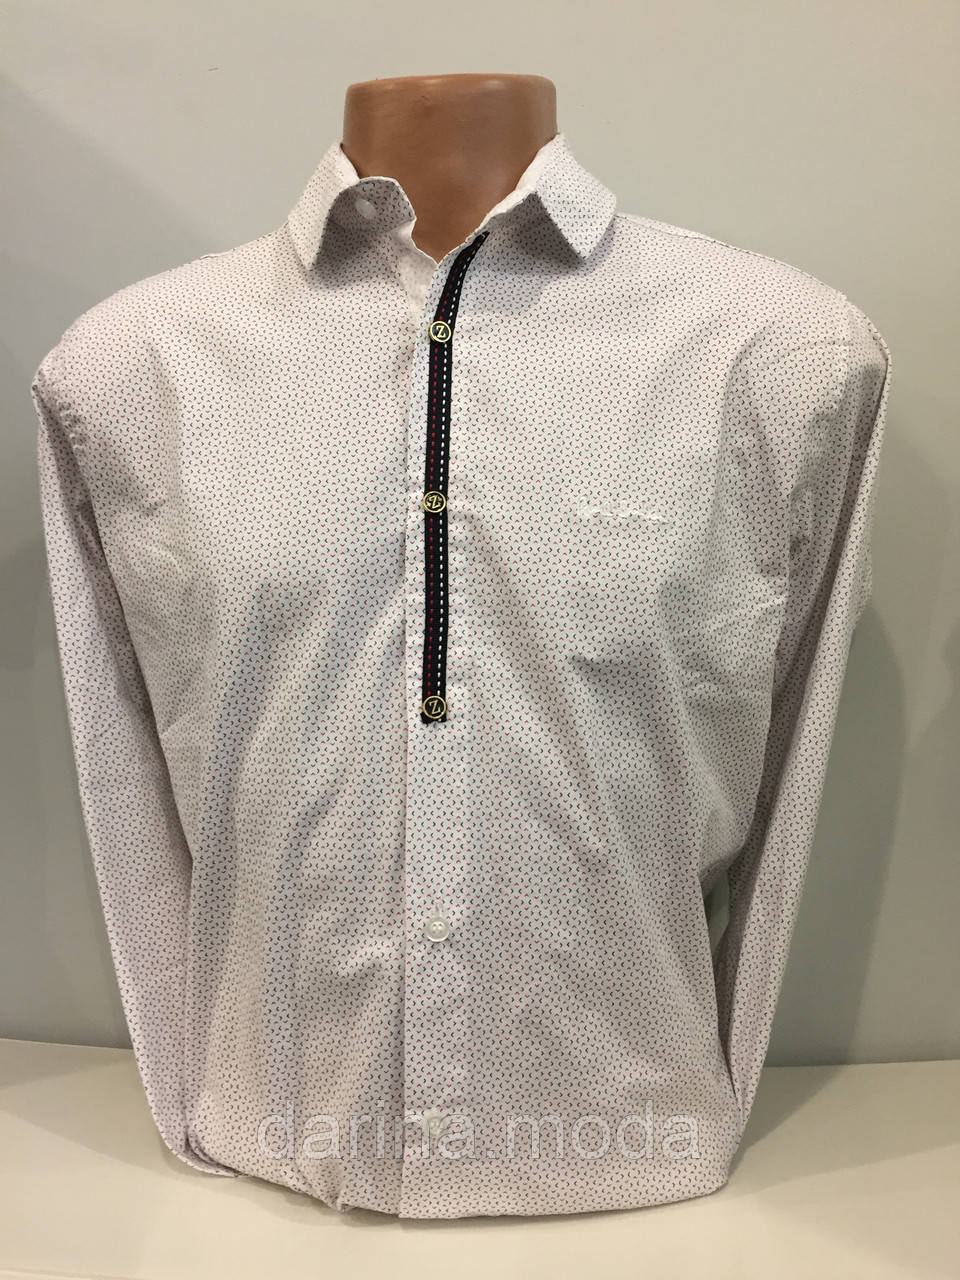 Мужская рубашка 2XL